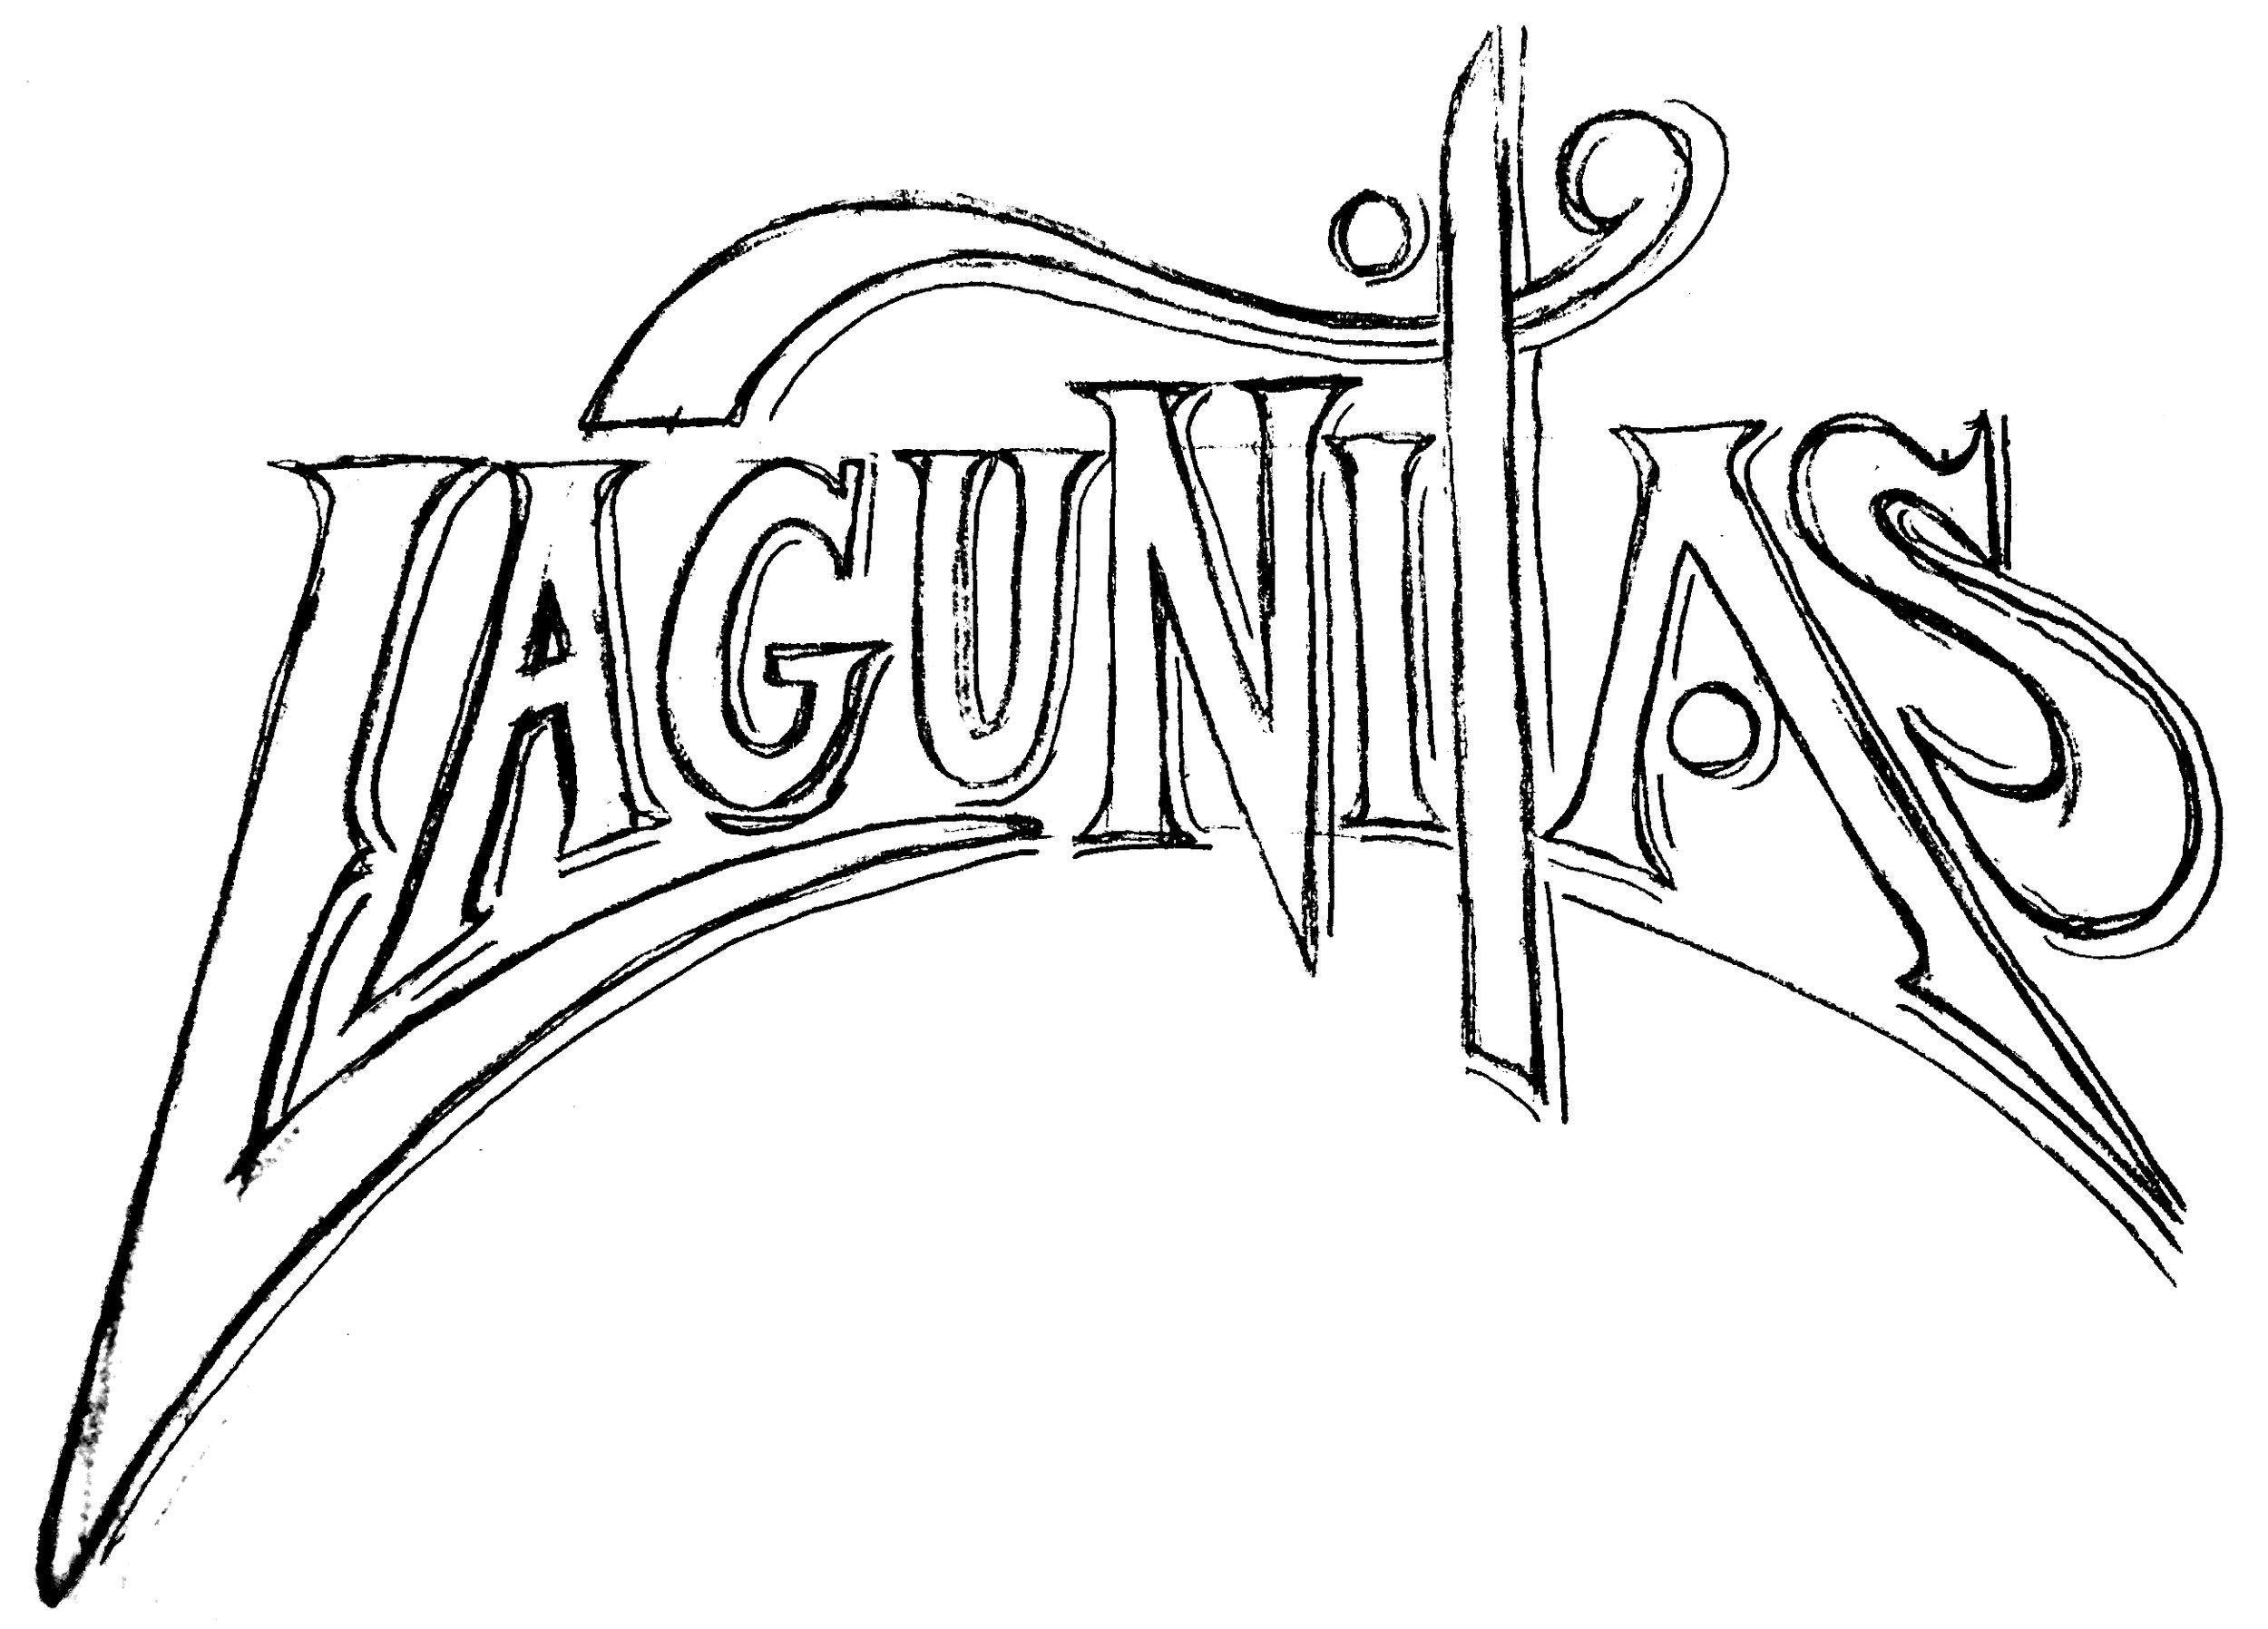 Lagunitas Logo Sketch 1.jpg